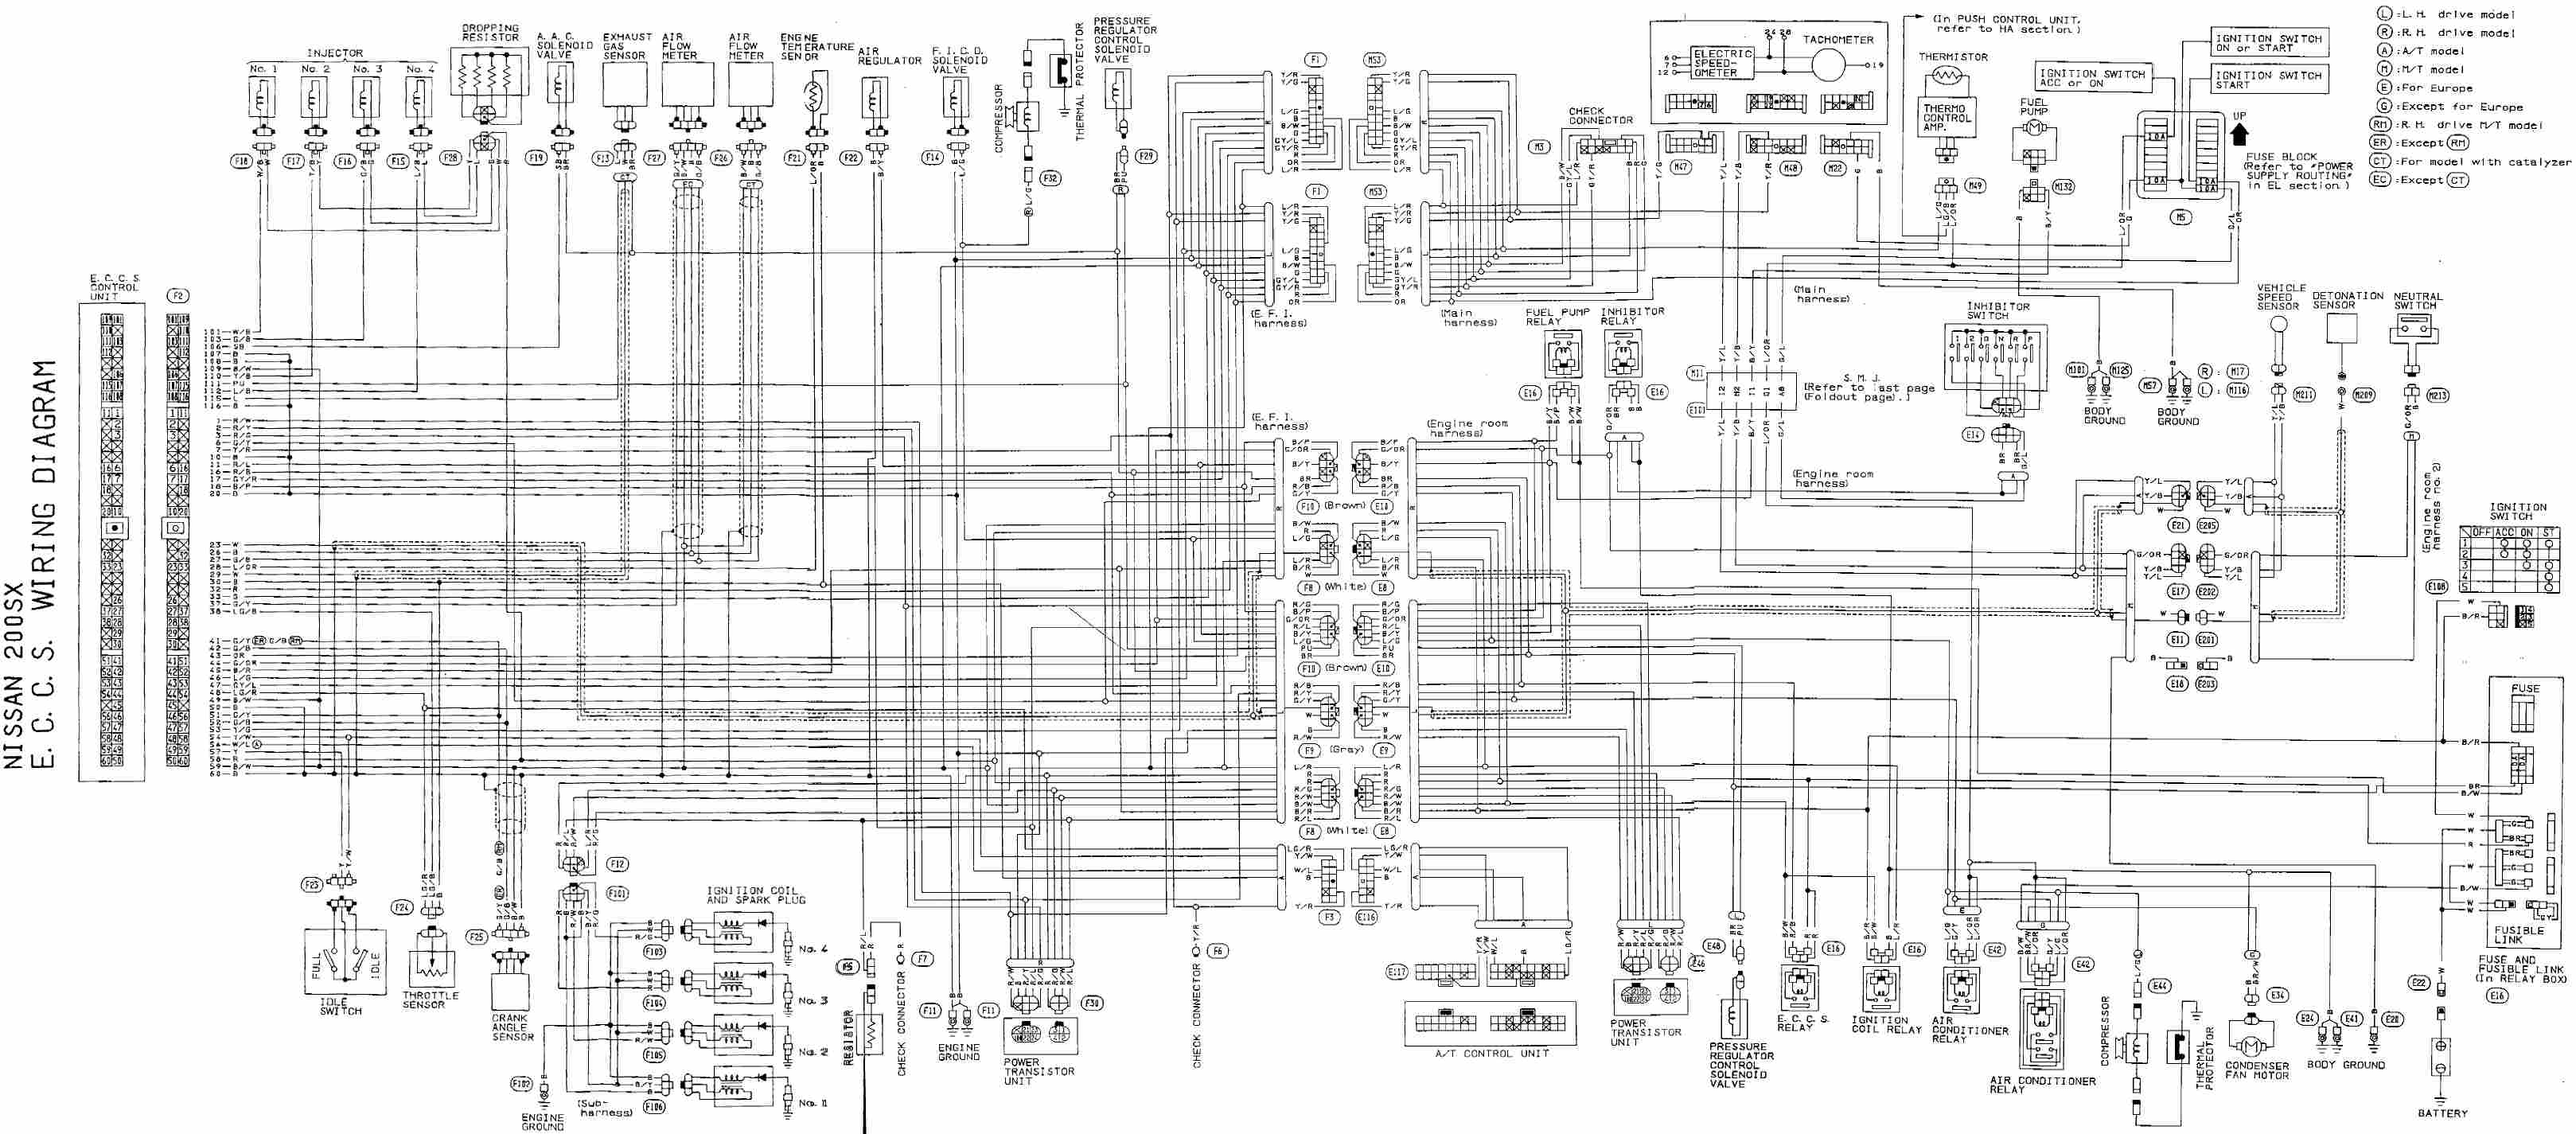 complete eccs wiring diagram of nissan 200x?t\\\\\\\\\\\\\\\\\\\\\\\\\\\\\\\\\\\\\\\\\\\\\\\\\\\\\\\\\\\\\\\=1506395457 nissan s13 wiring diagram free download wiring diagrams schematics